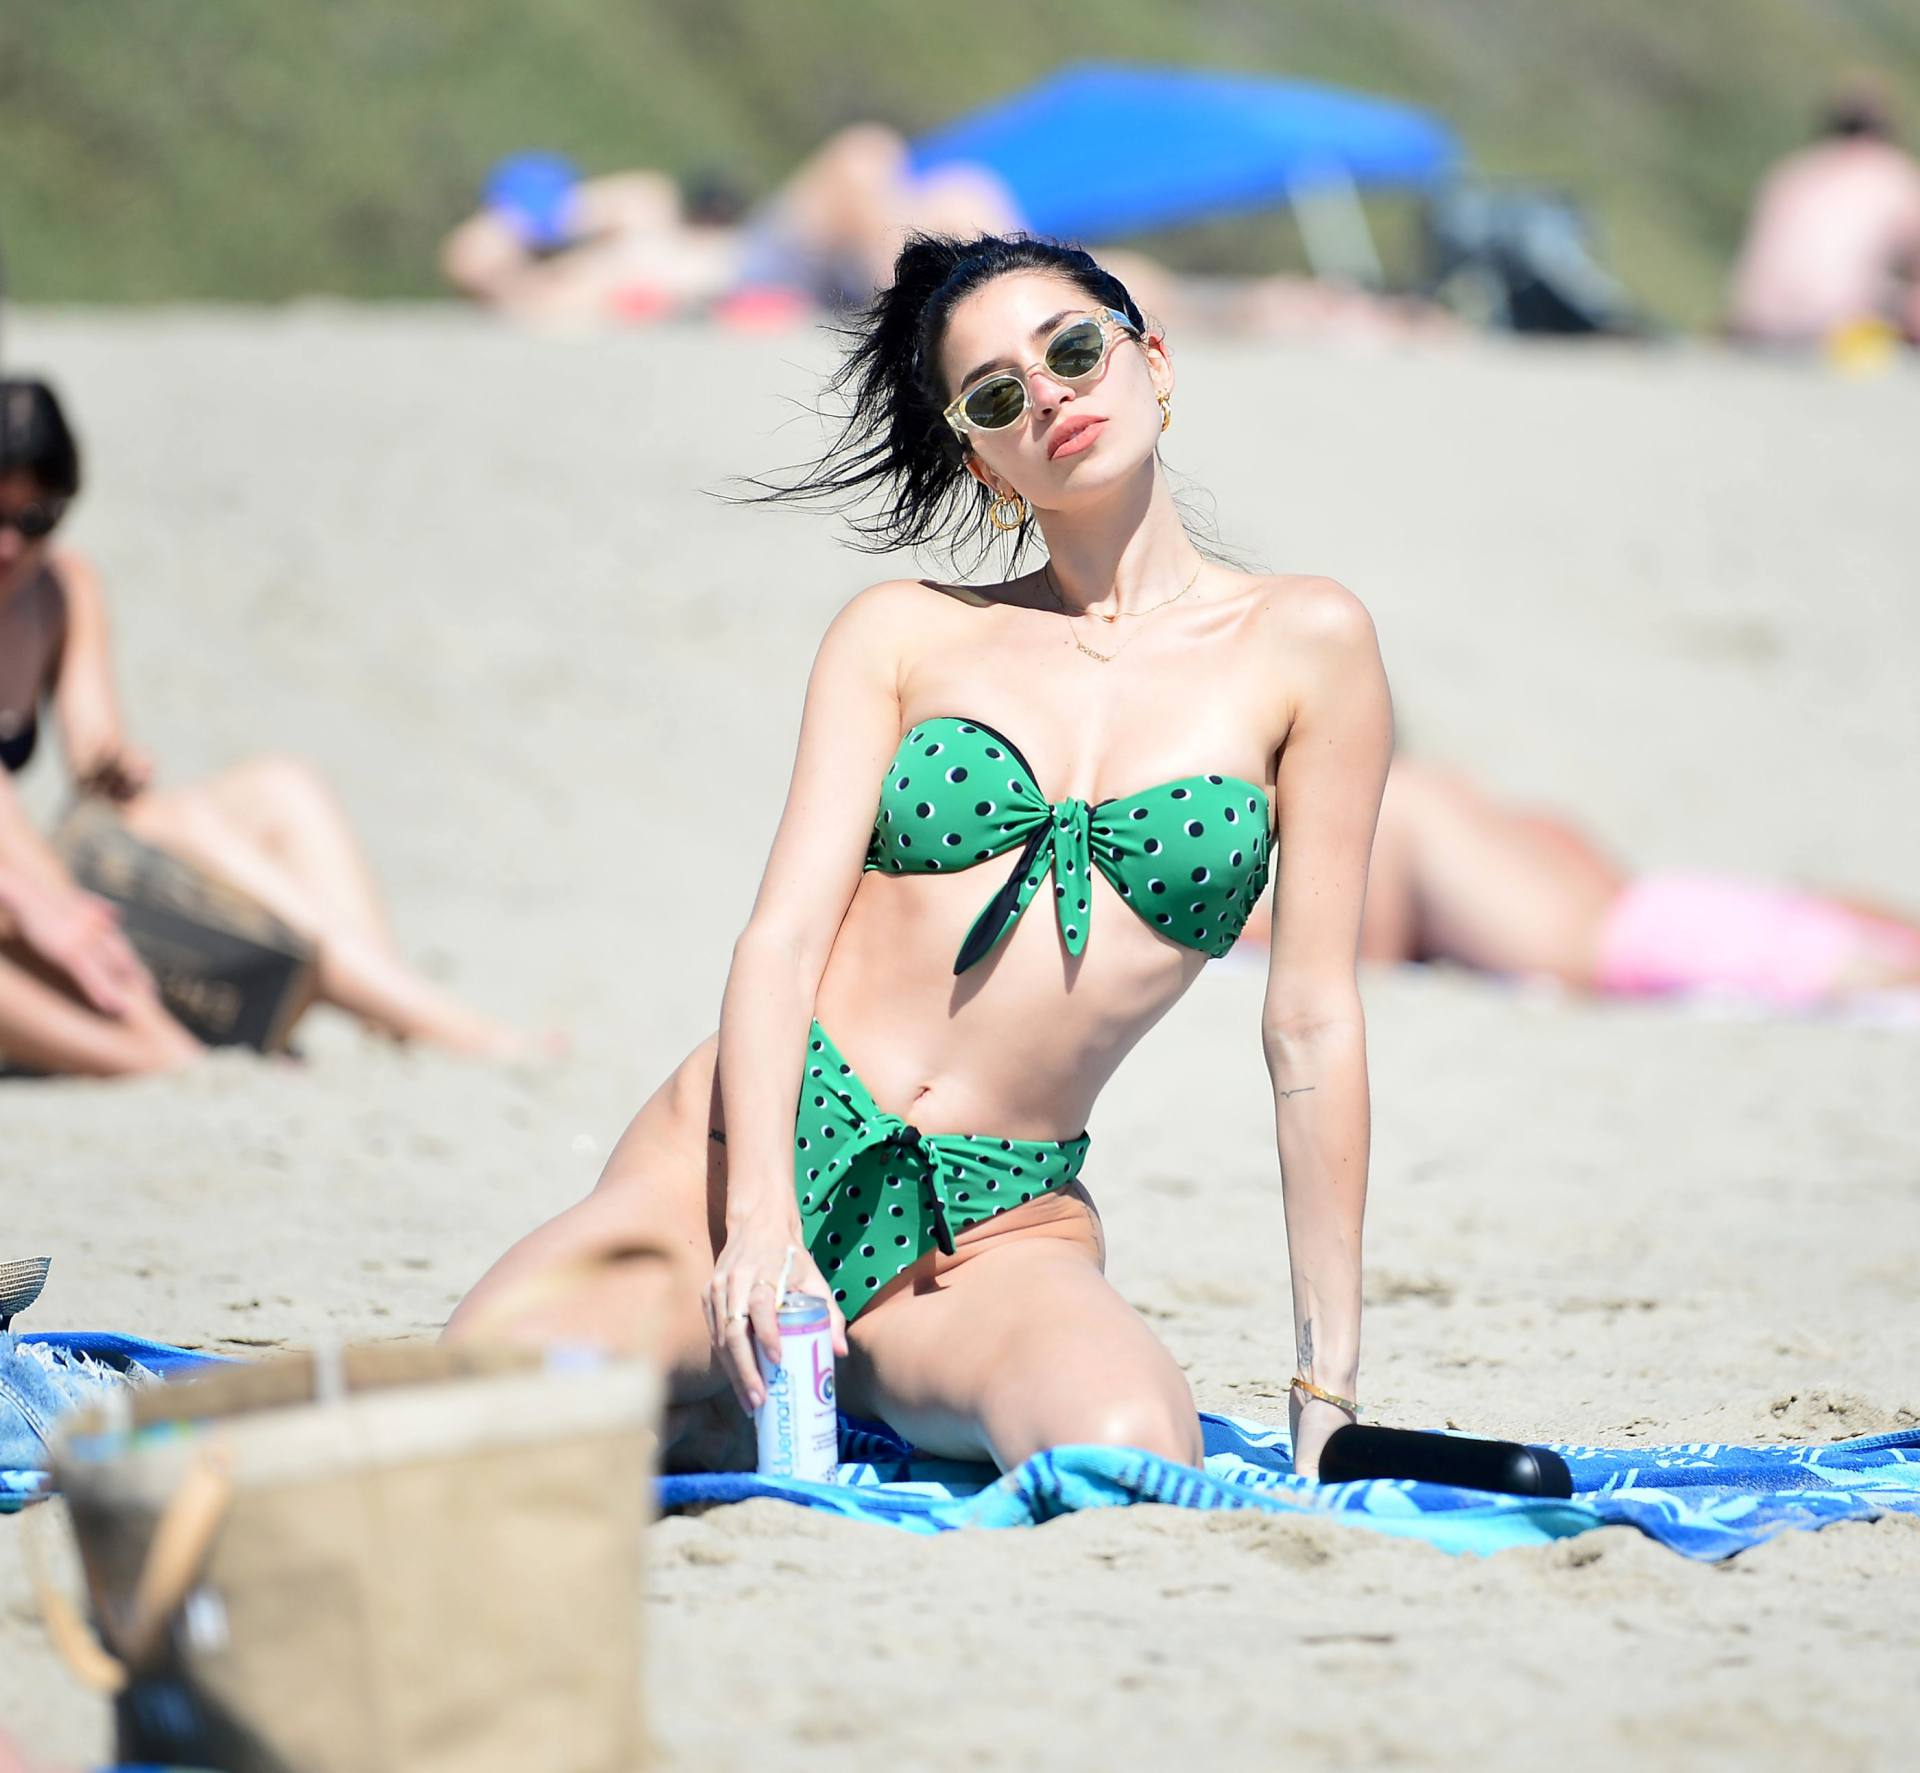 Nicole Williams – Fantastic Body In Skimpy Bikini At The Beach In Malibu 0013